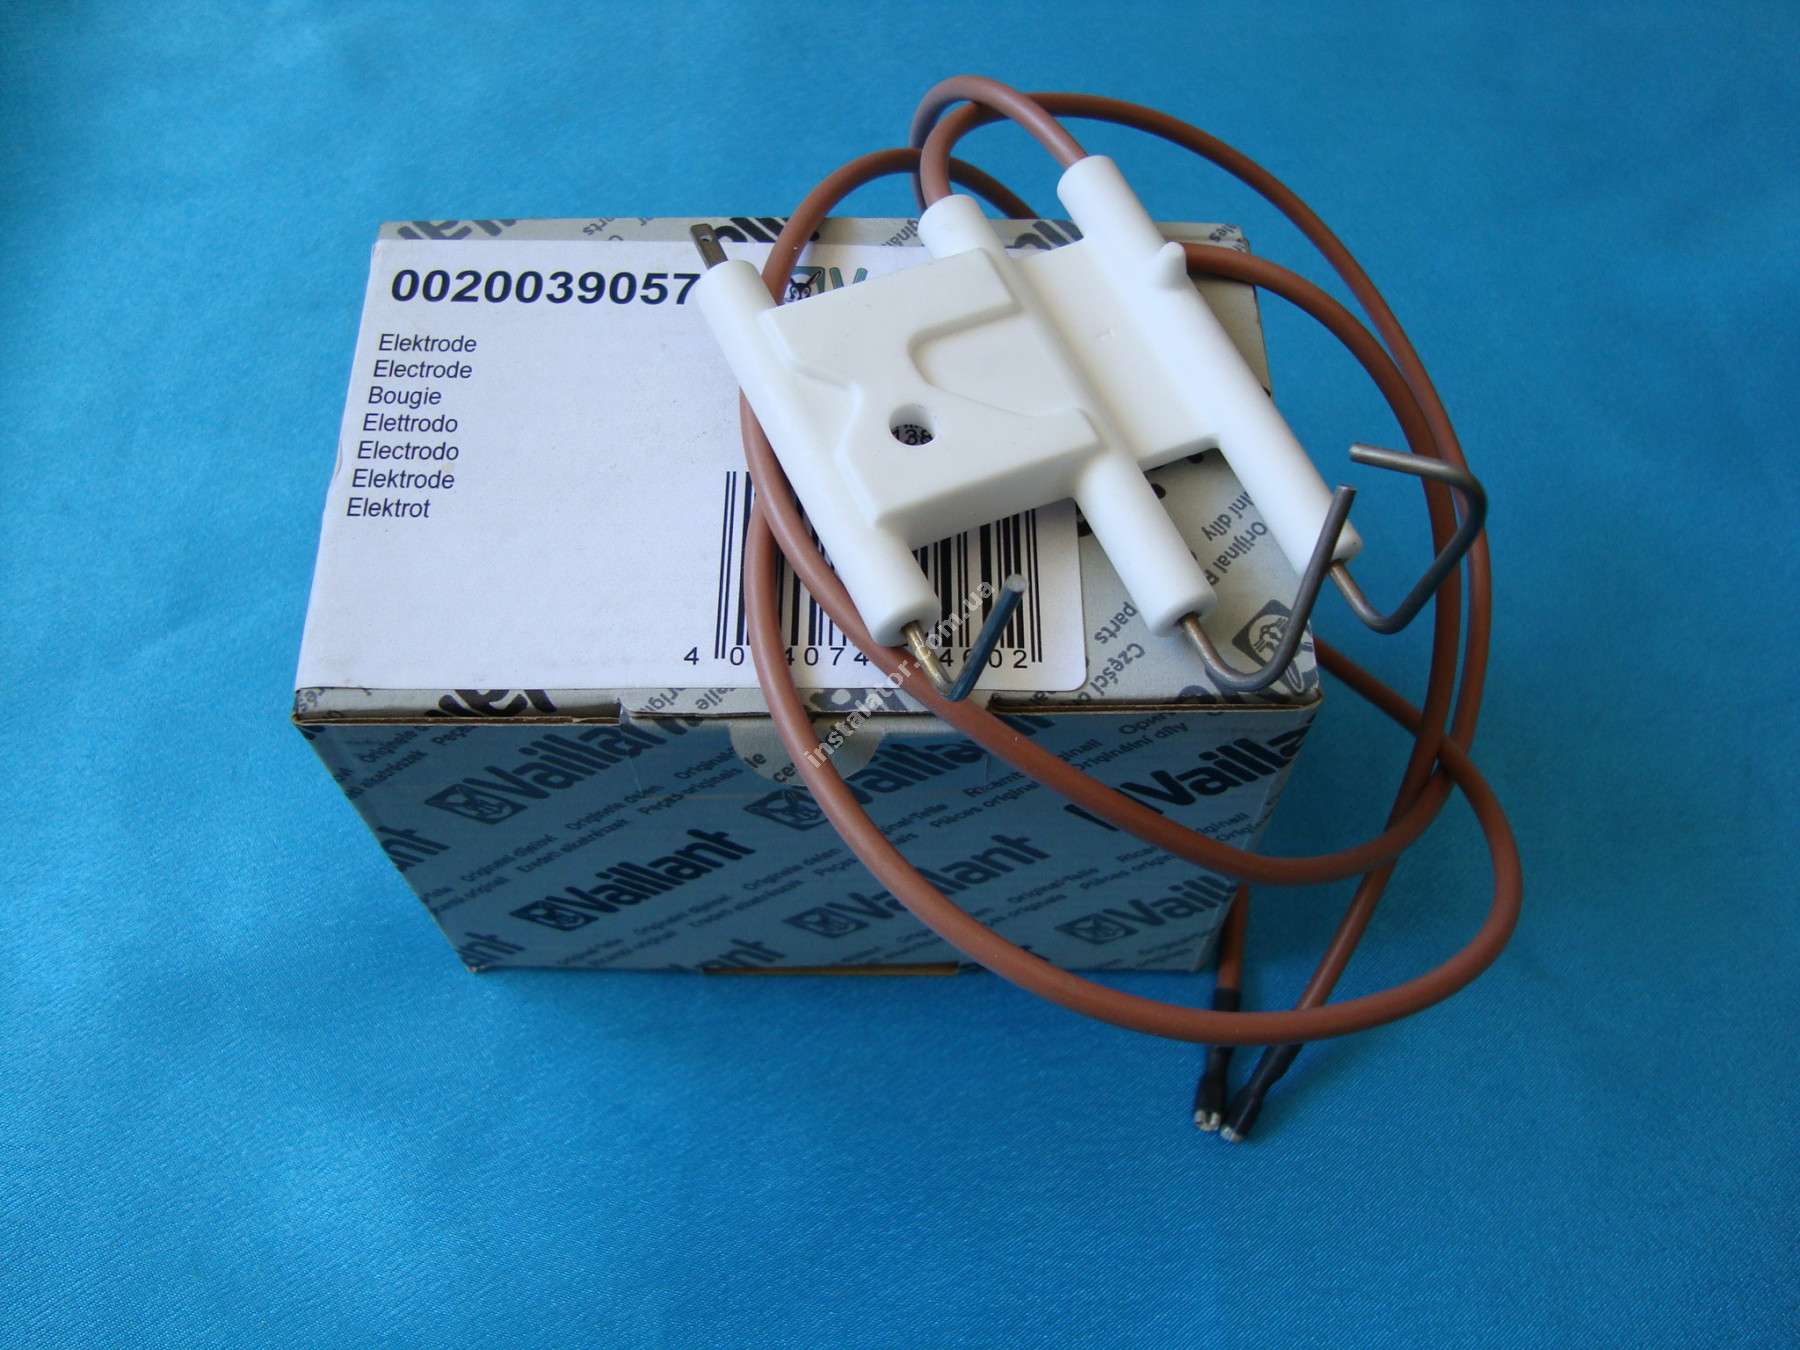 0020039057 Група електродів  VAILLANT atmoTec, turboTec Pro\Plus   full-image-2